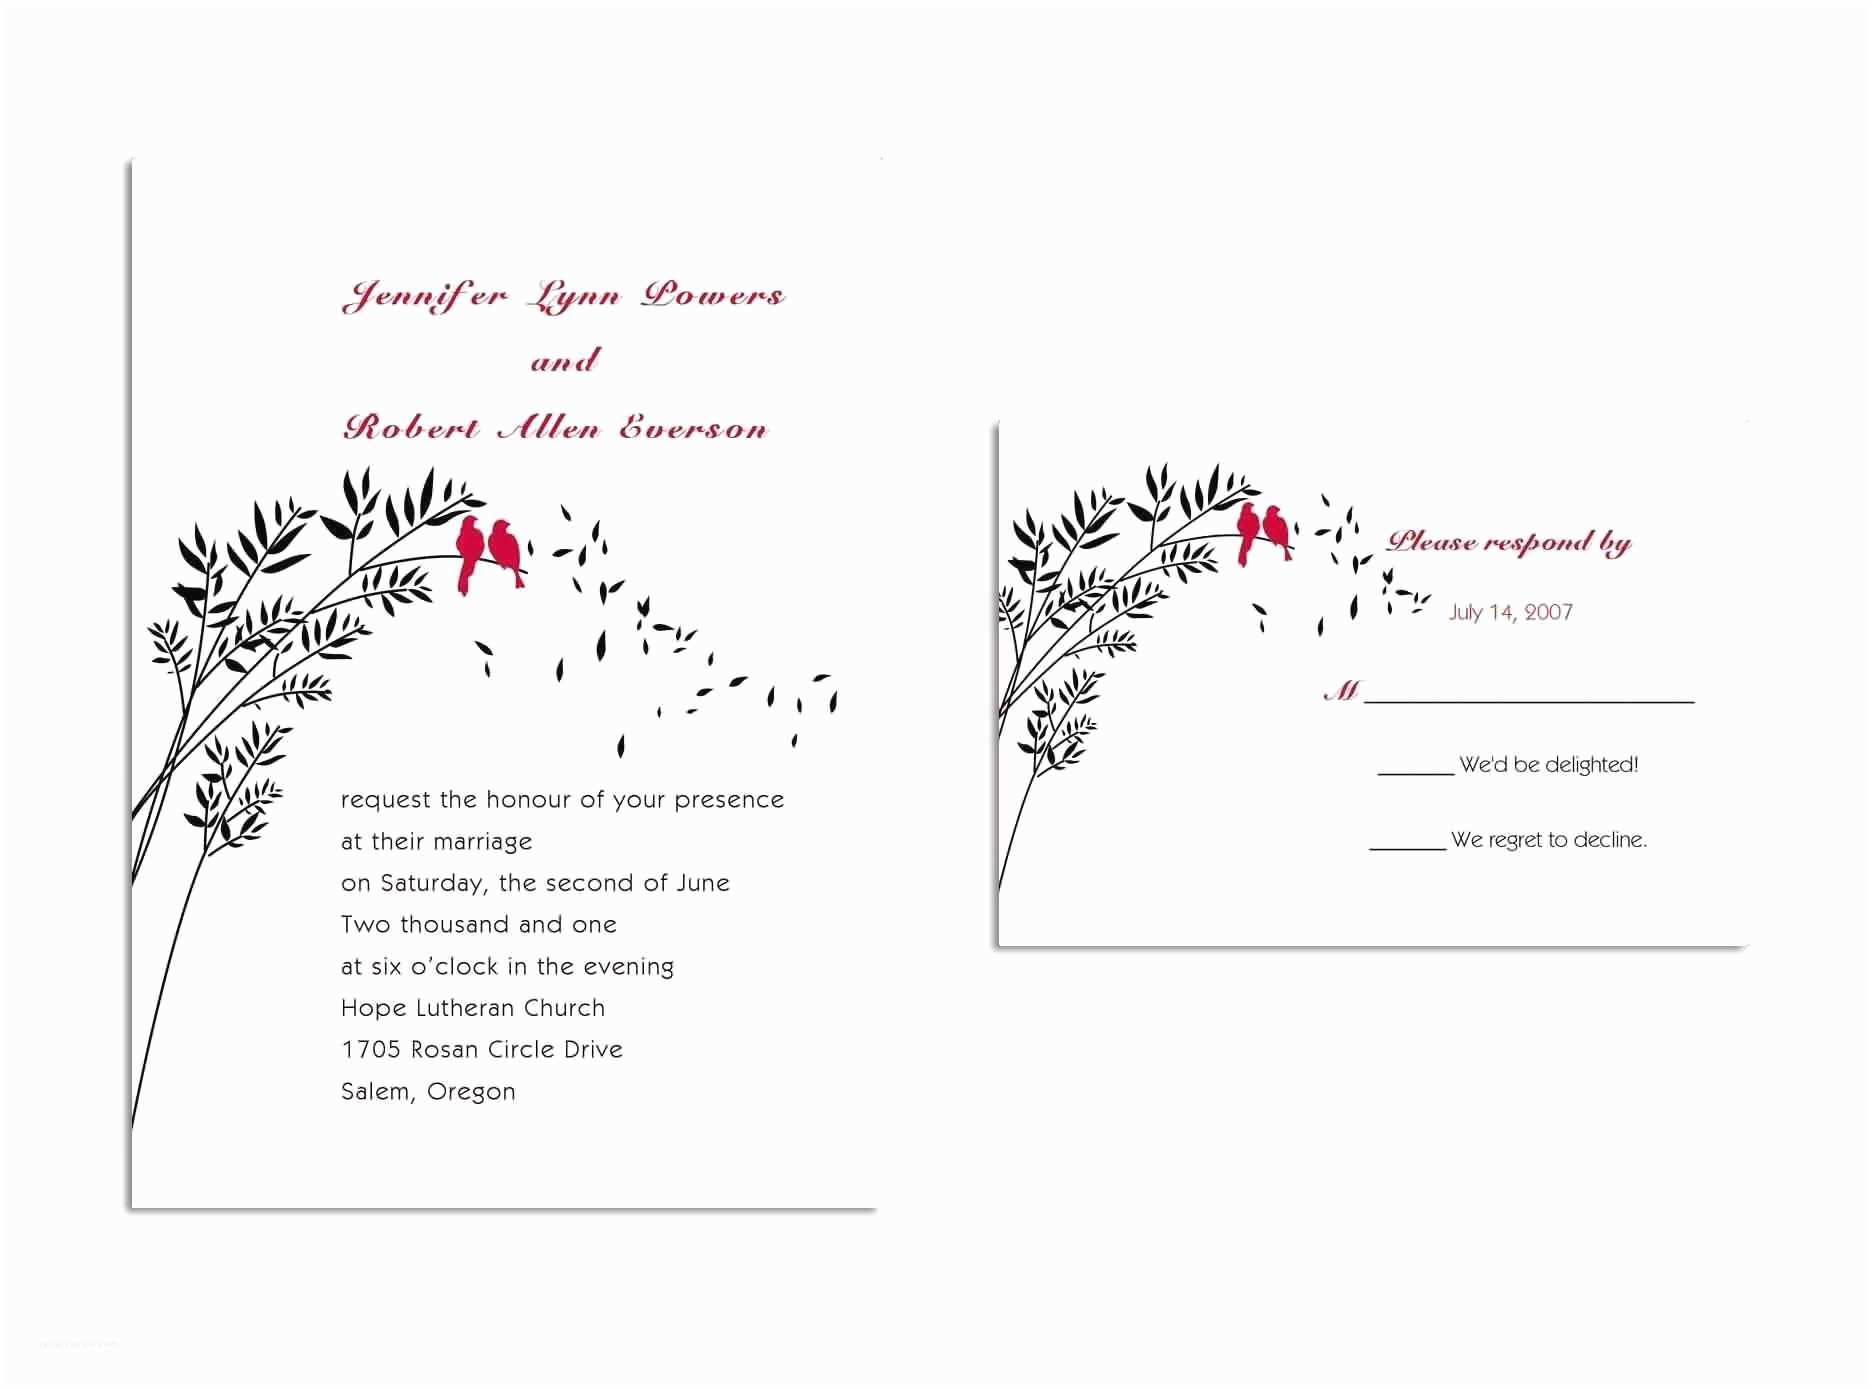 Wedding Invitation Response Card Wedding Invitations Response Cards Wedding Invitations